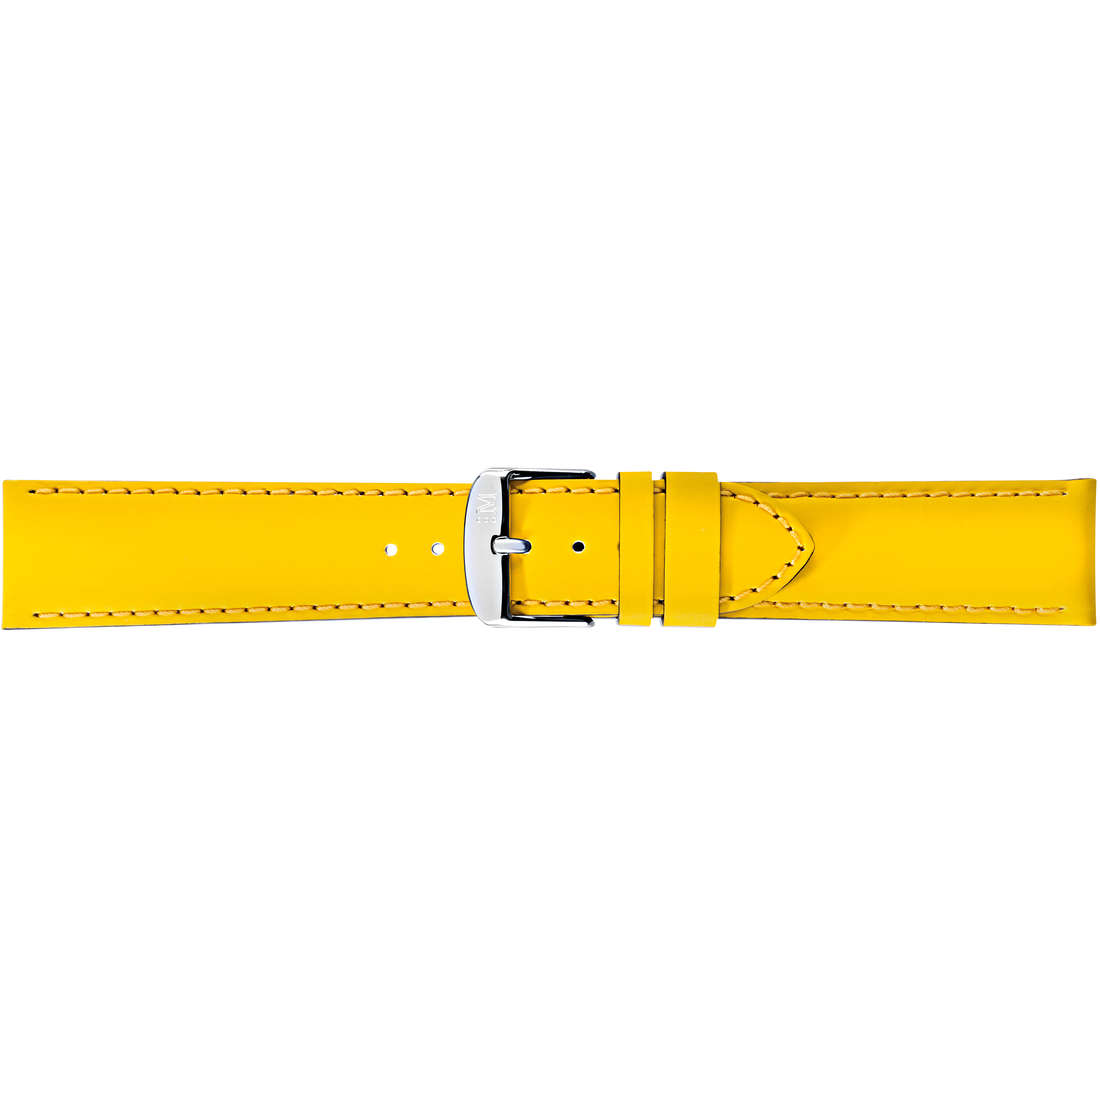 watch watch bands watch straps man Morellato Linea Sport A01X4614B55097CR18